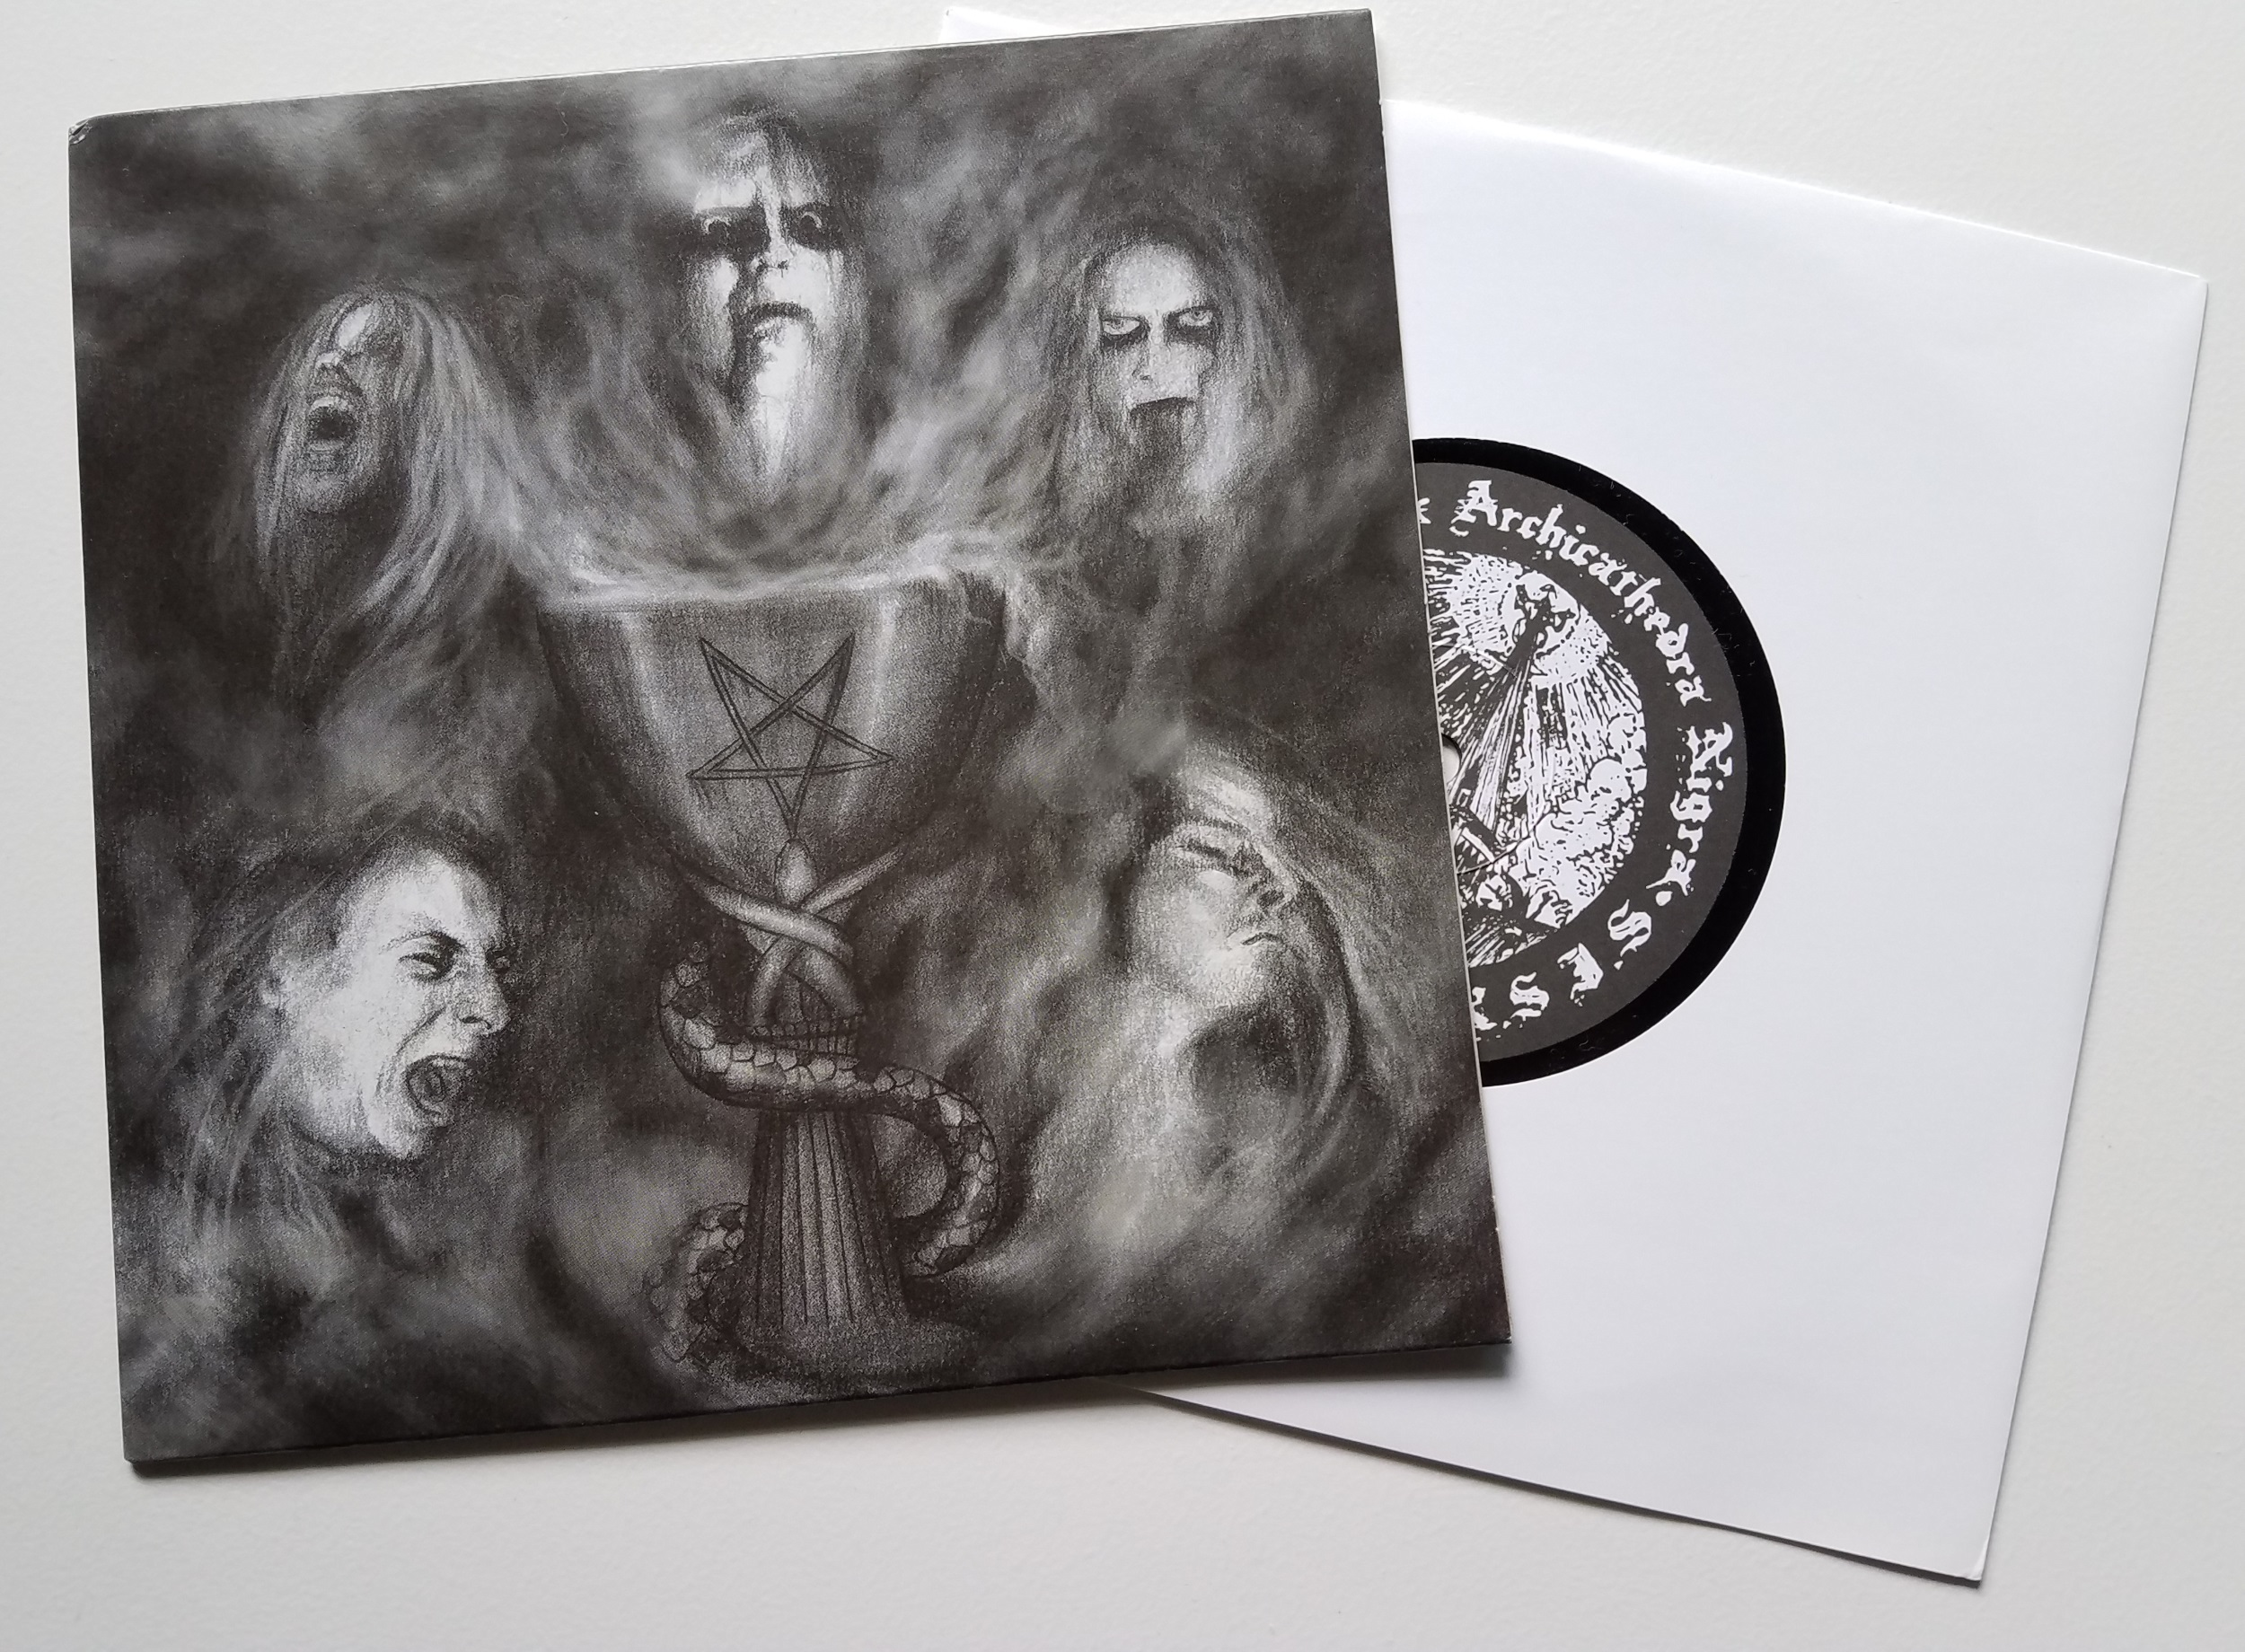 Celestial Bloodshed / Urfaust - Split 7